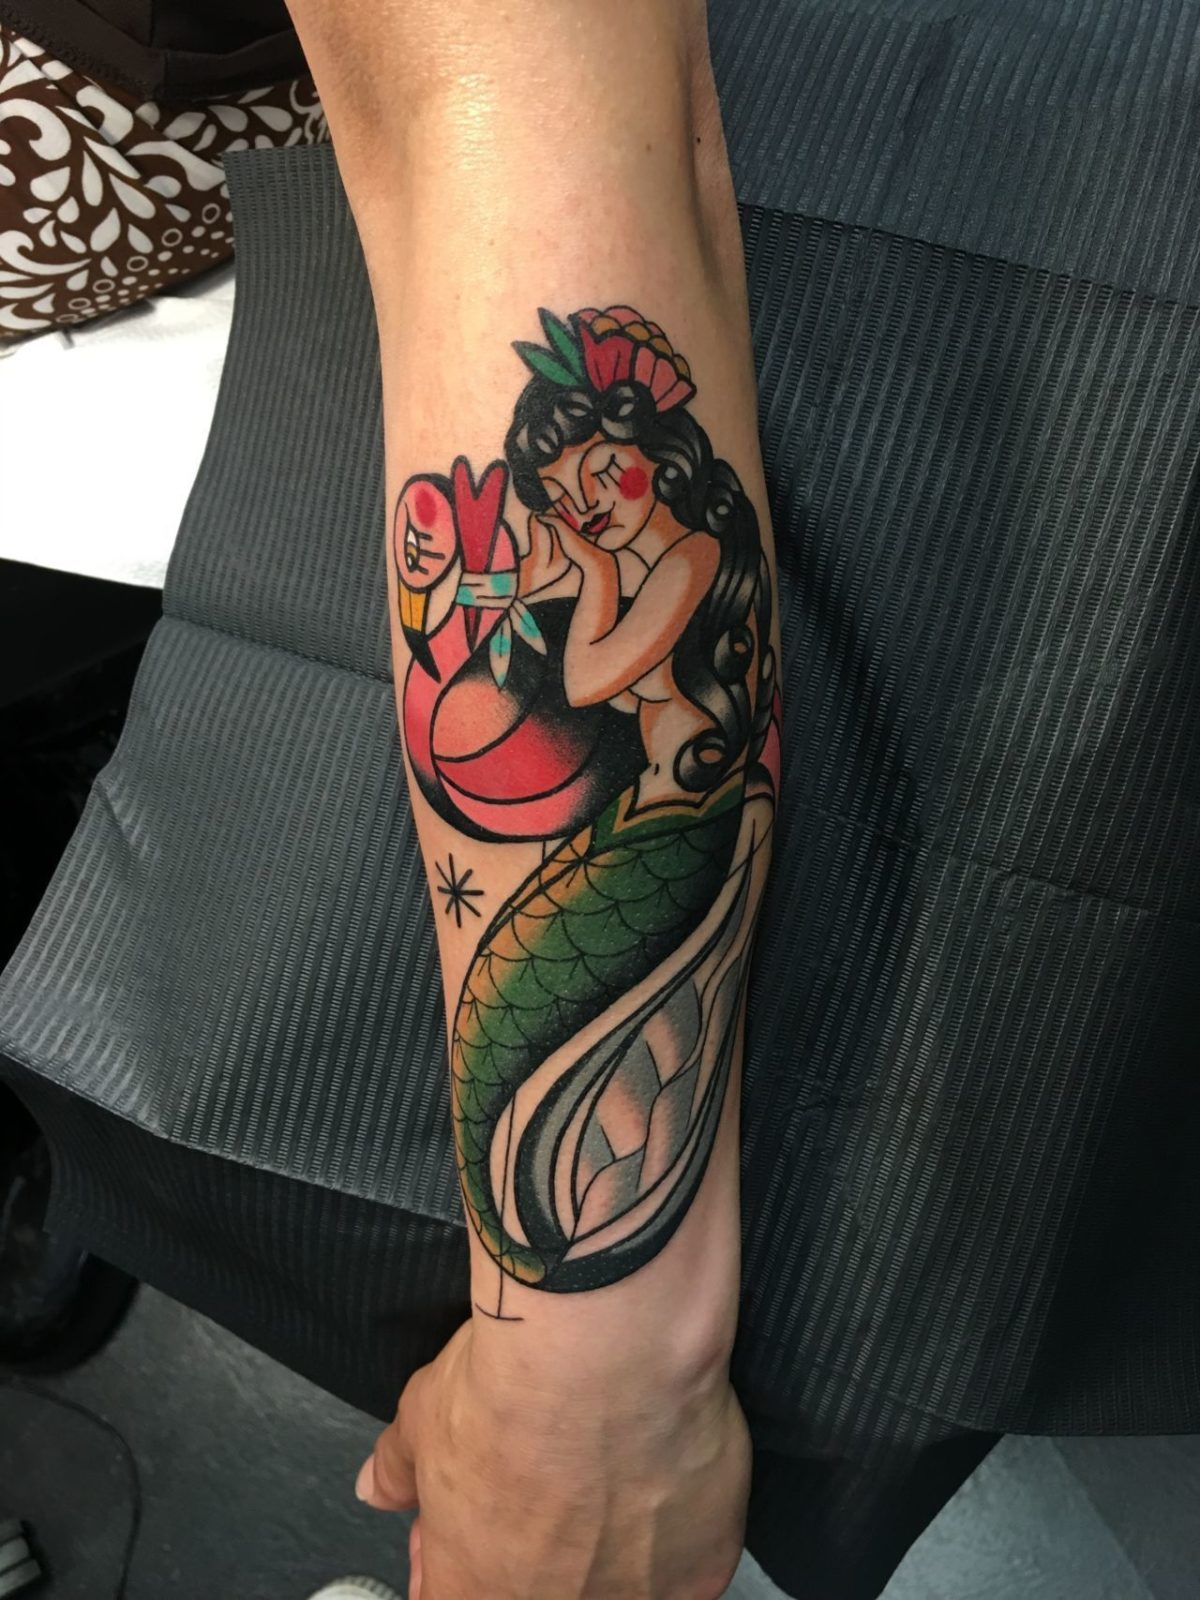 Stylish Mermaid Tattoo Designs   Beautiful Mermaid Tattoo Ideas